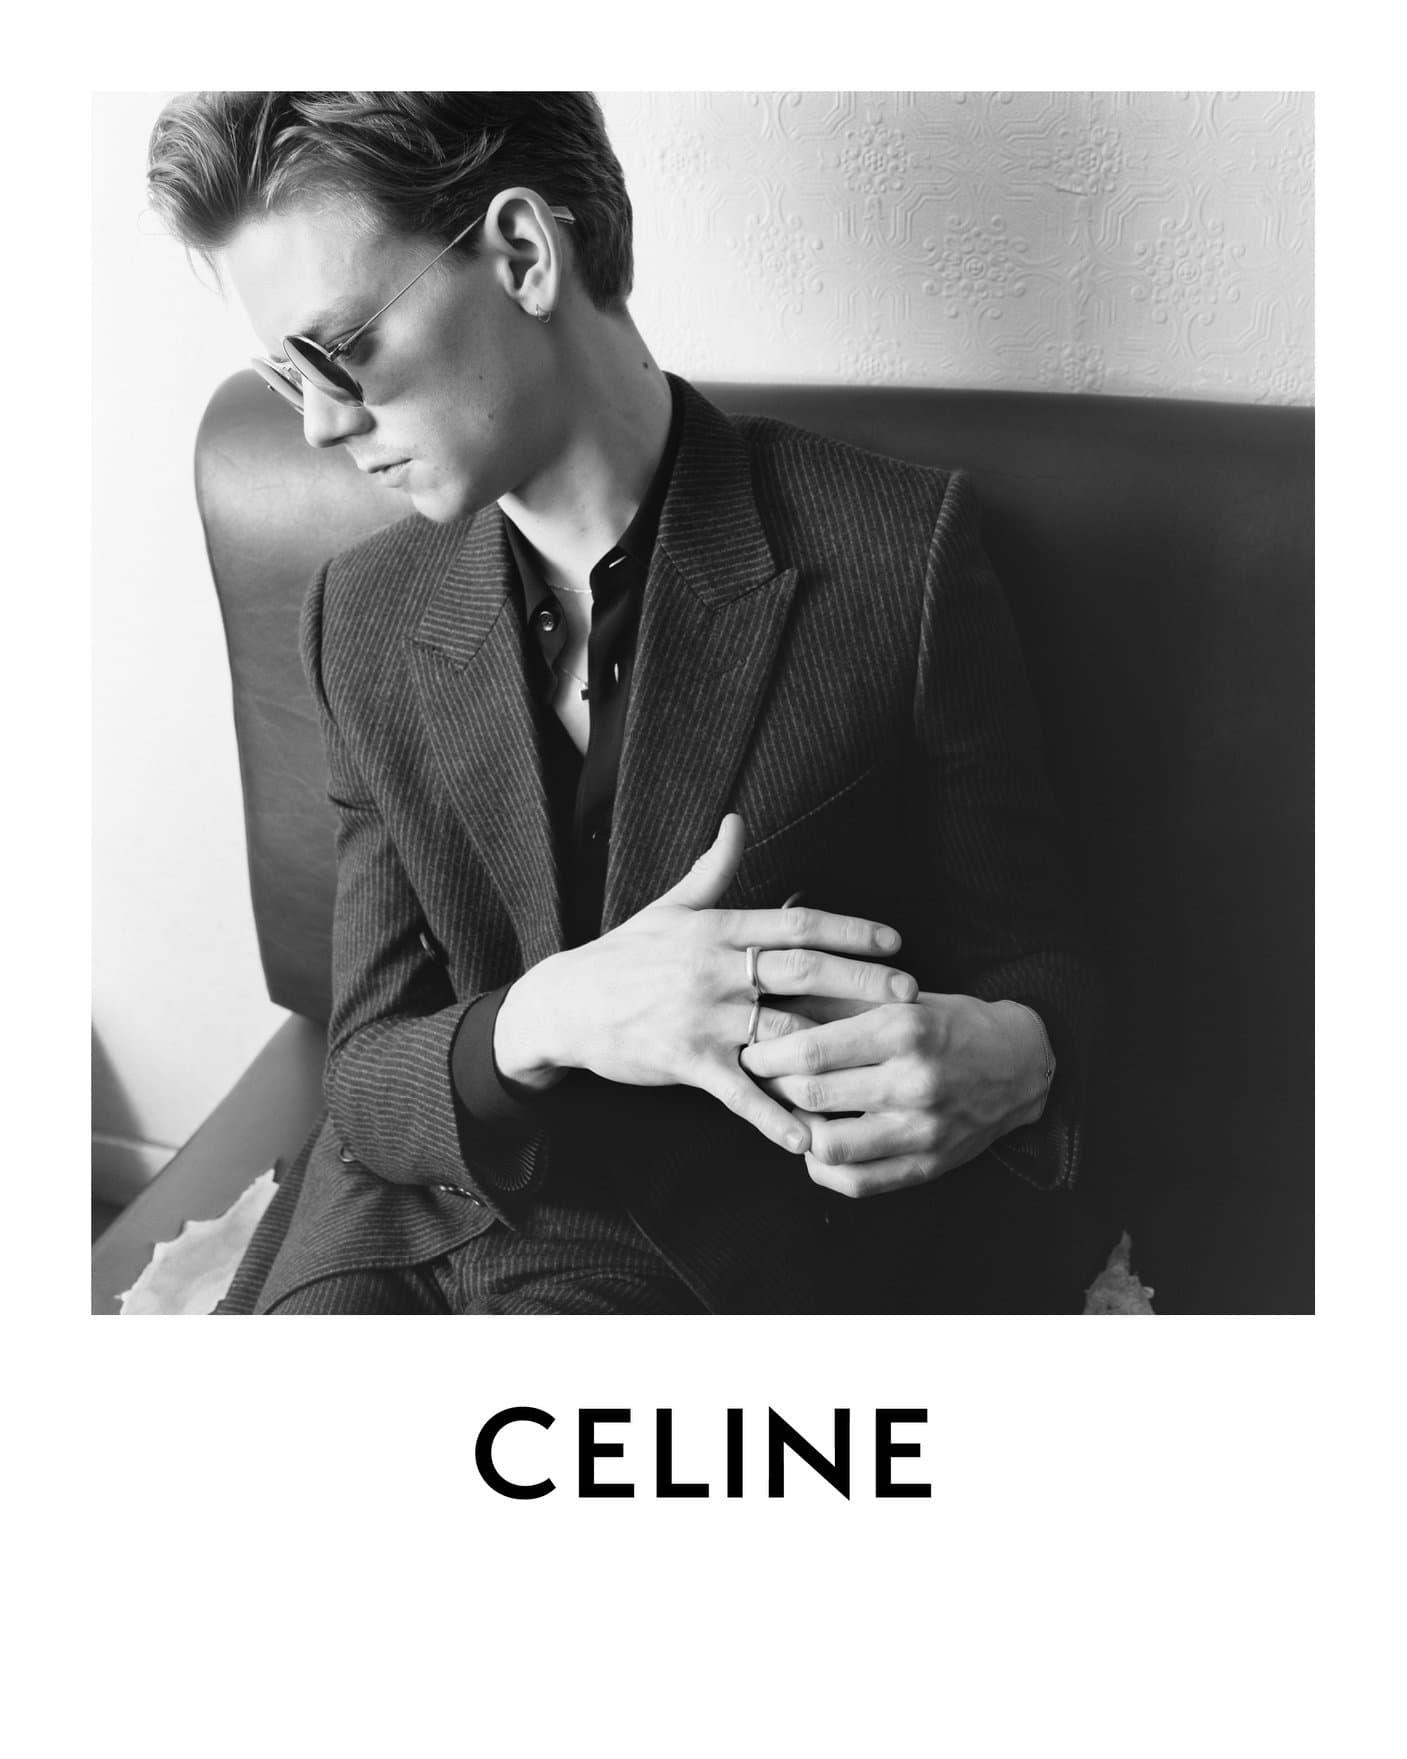 Celine Spring 2021 Ad Campaign Film & Photos